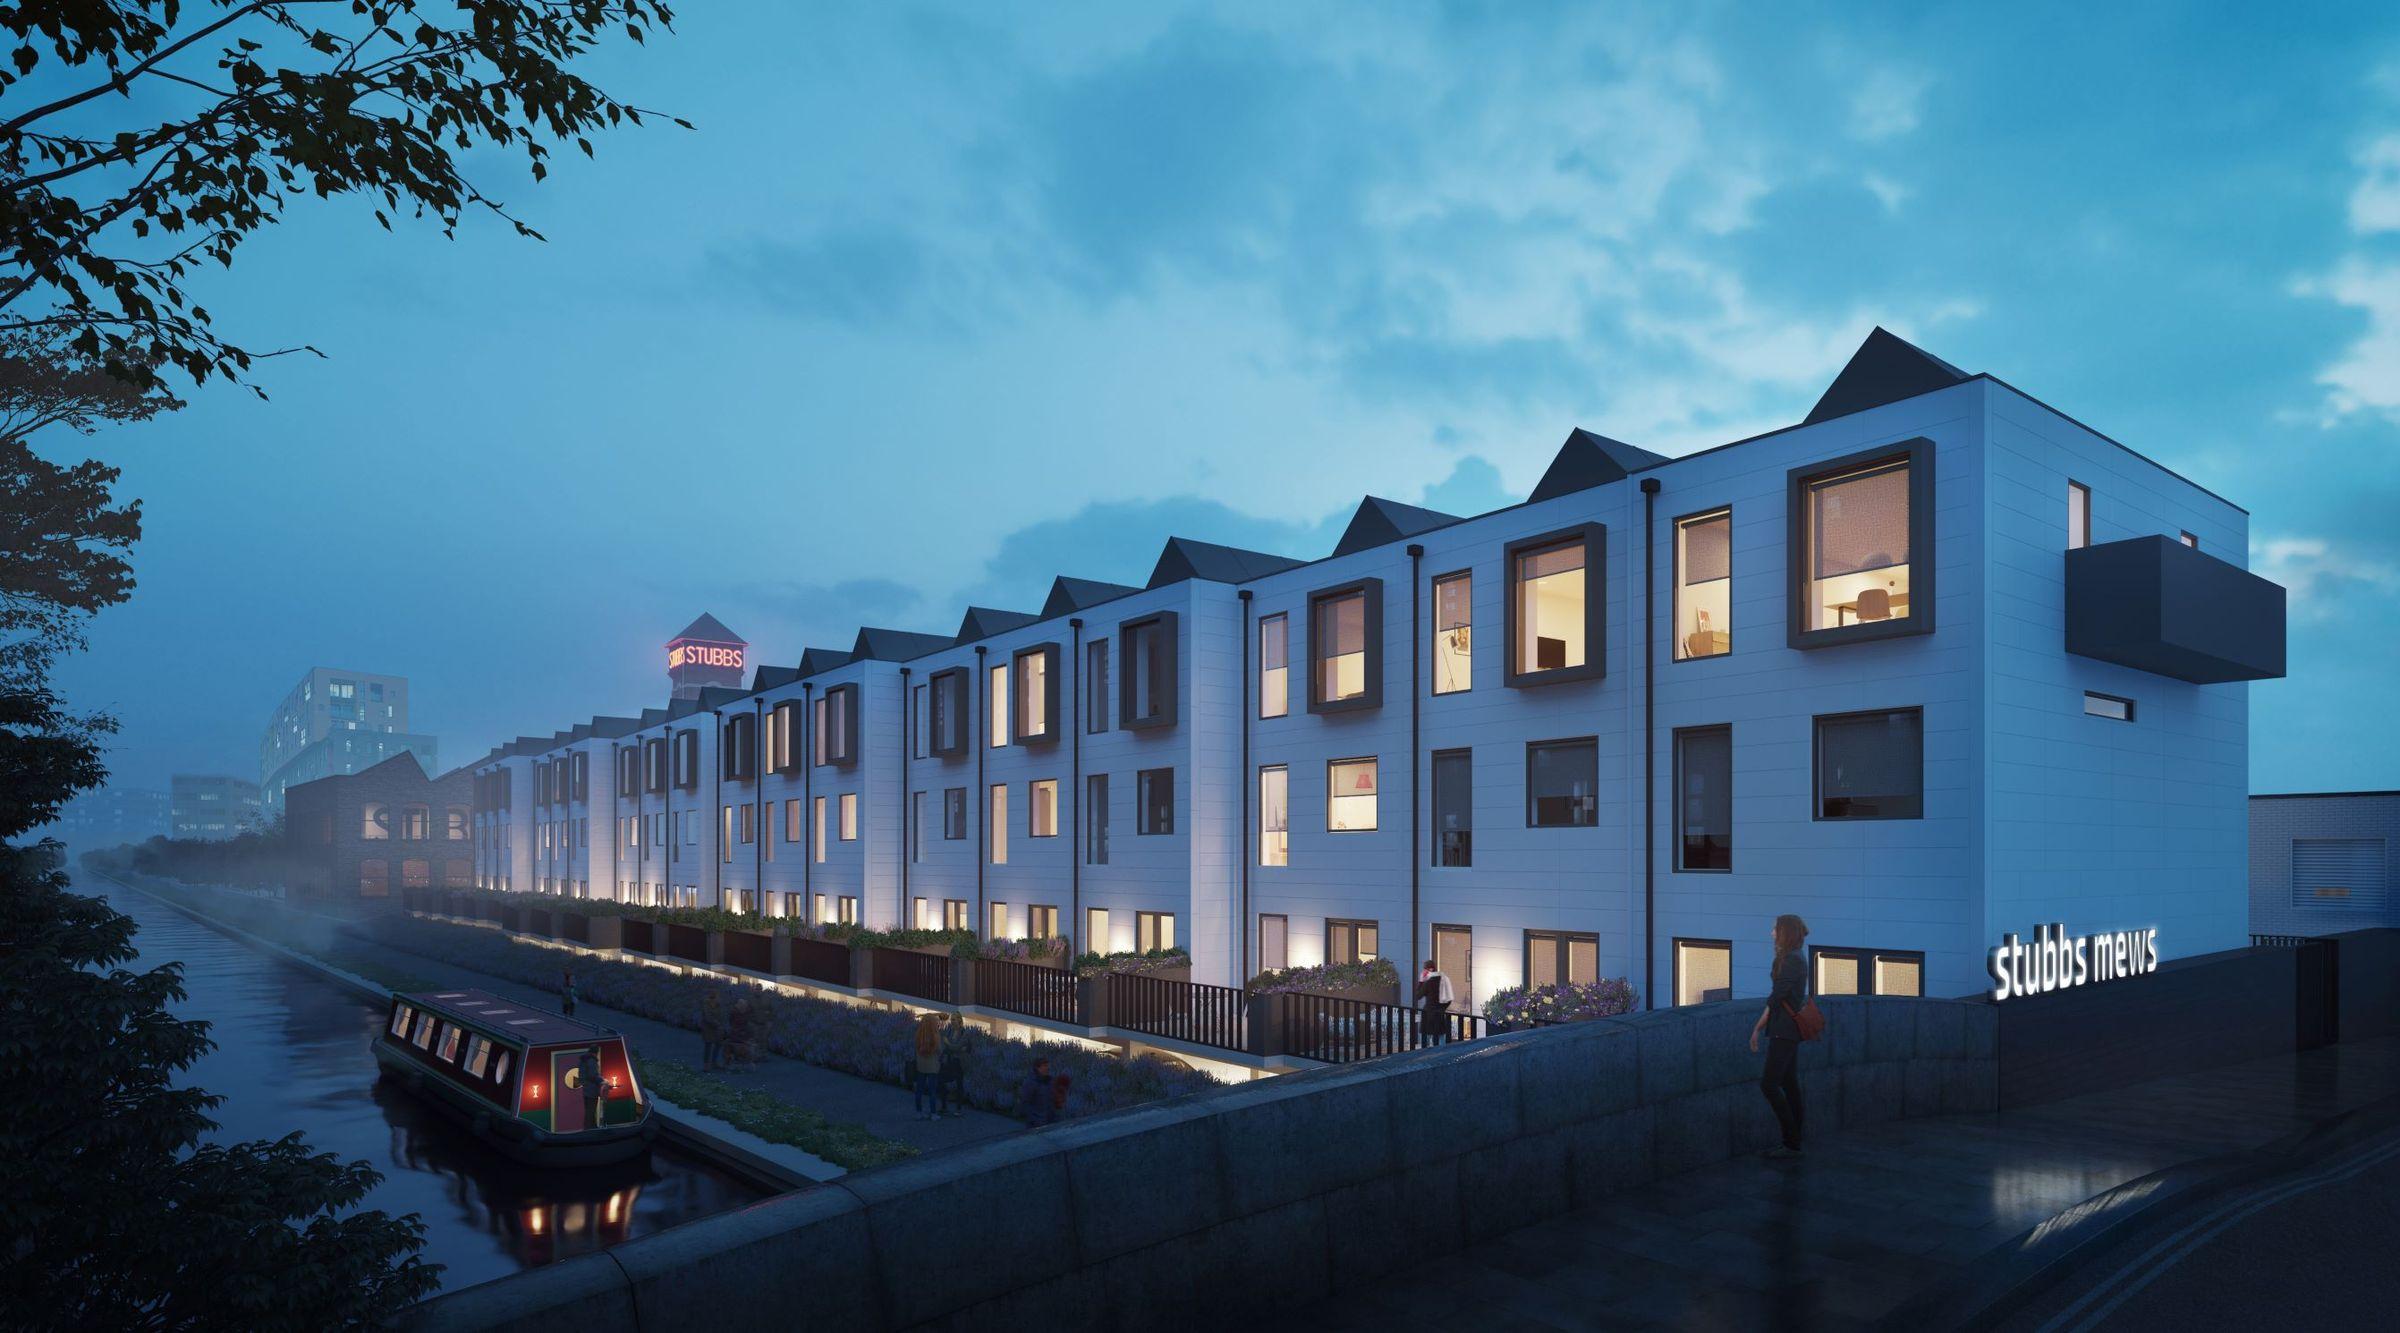 New Islington development image 1 of 1